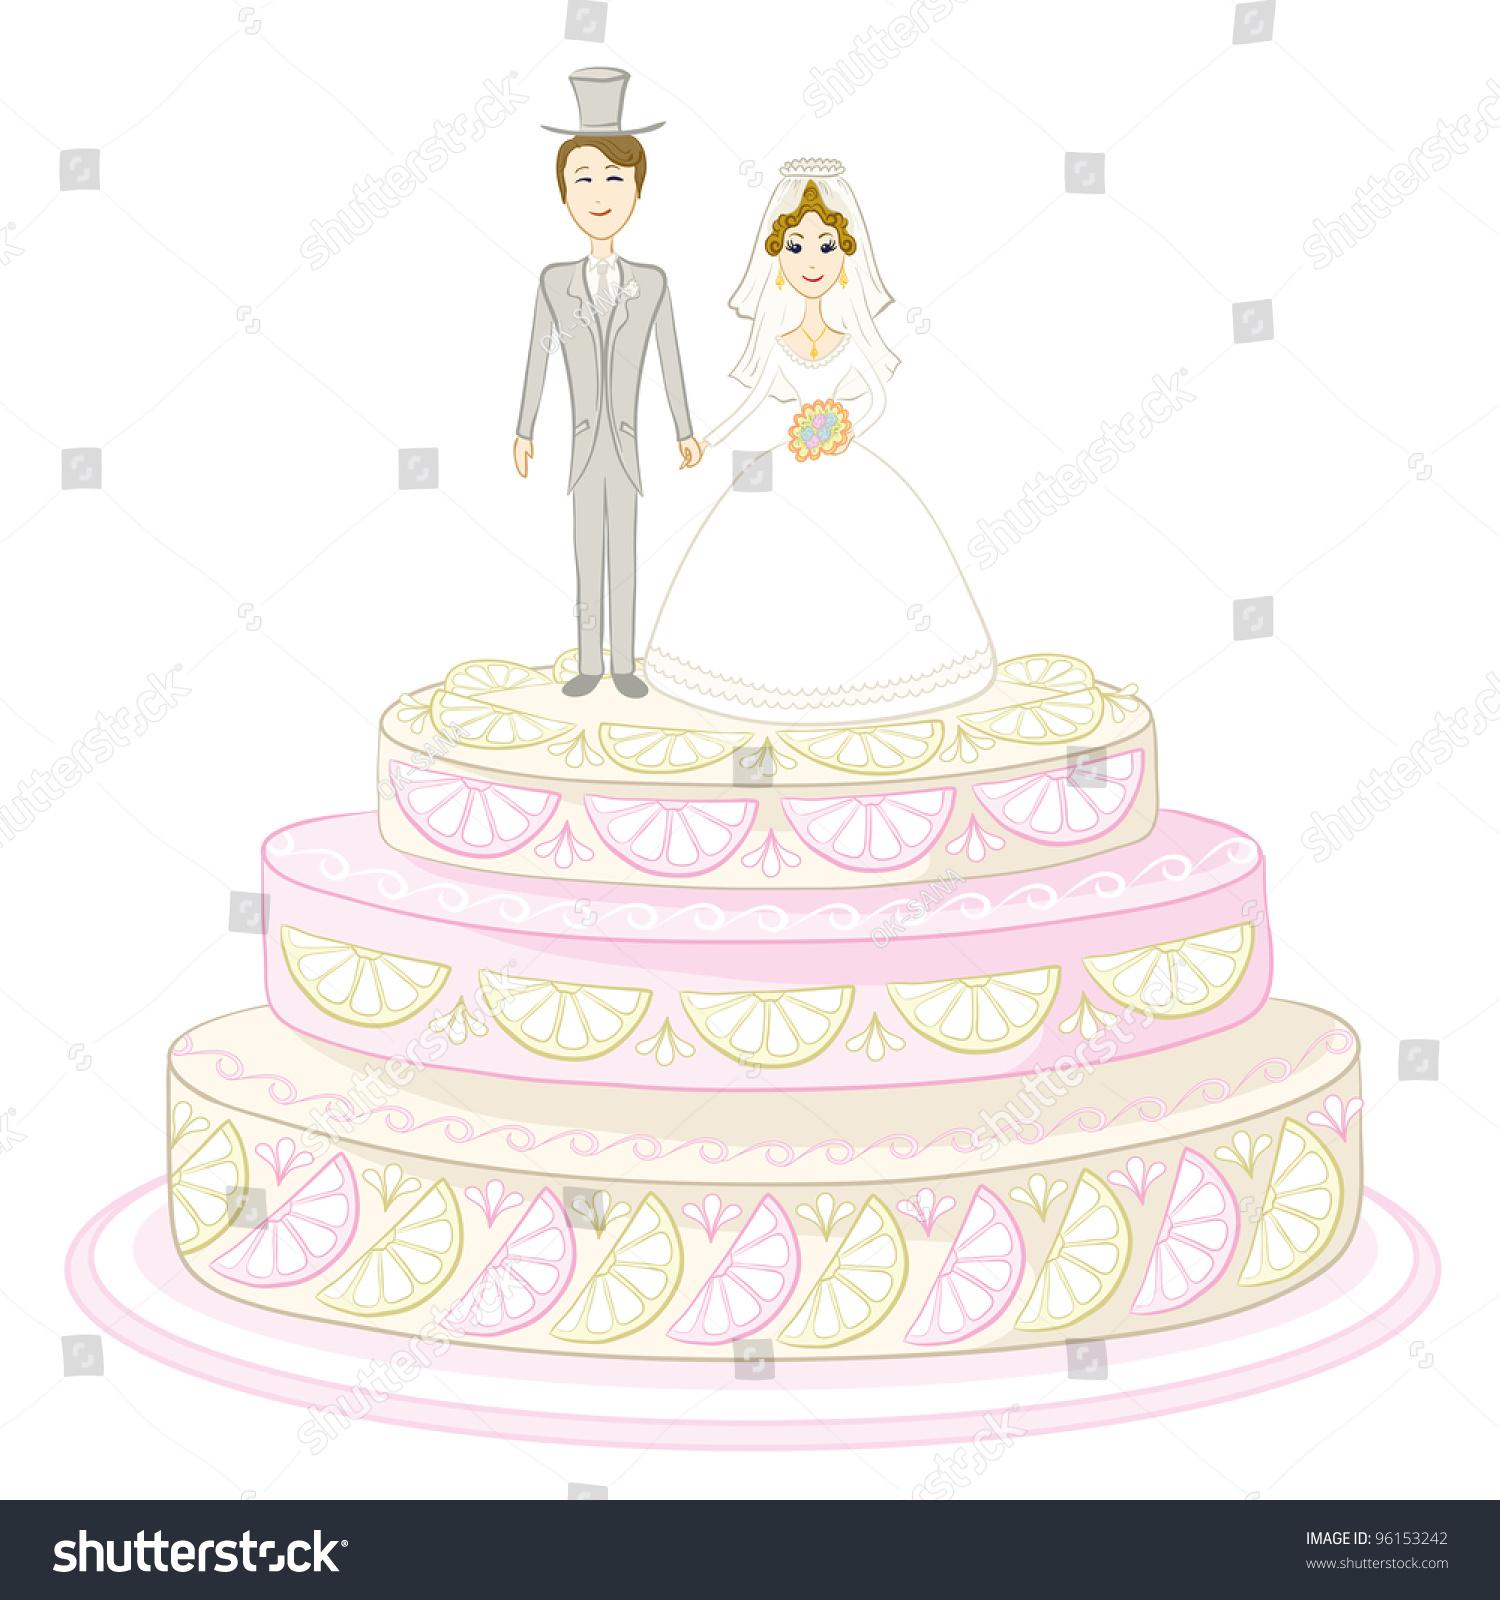 Holiday Wedding Pie Bride Groom Figurines Stock Illustration ...